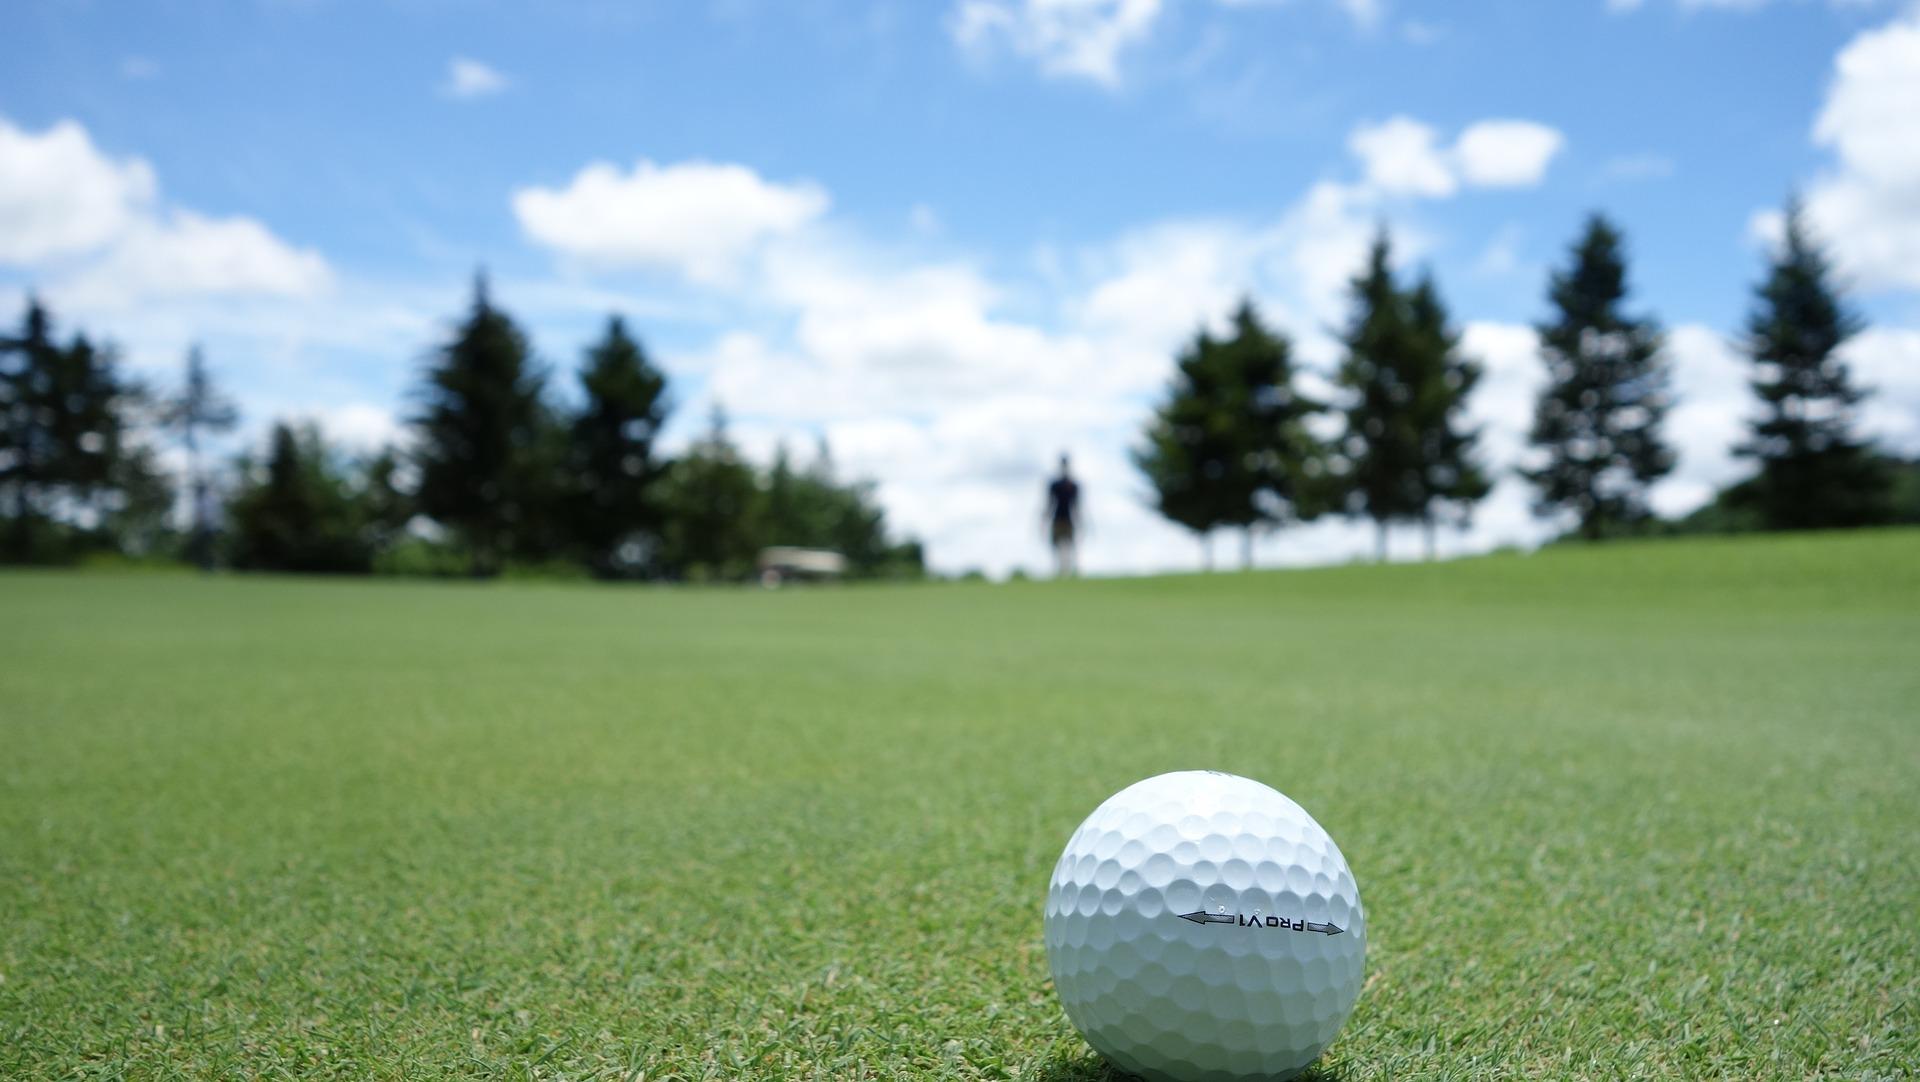 golf-2217600_1920.jpg